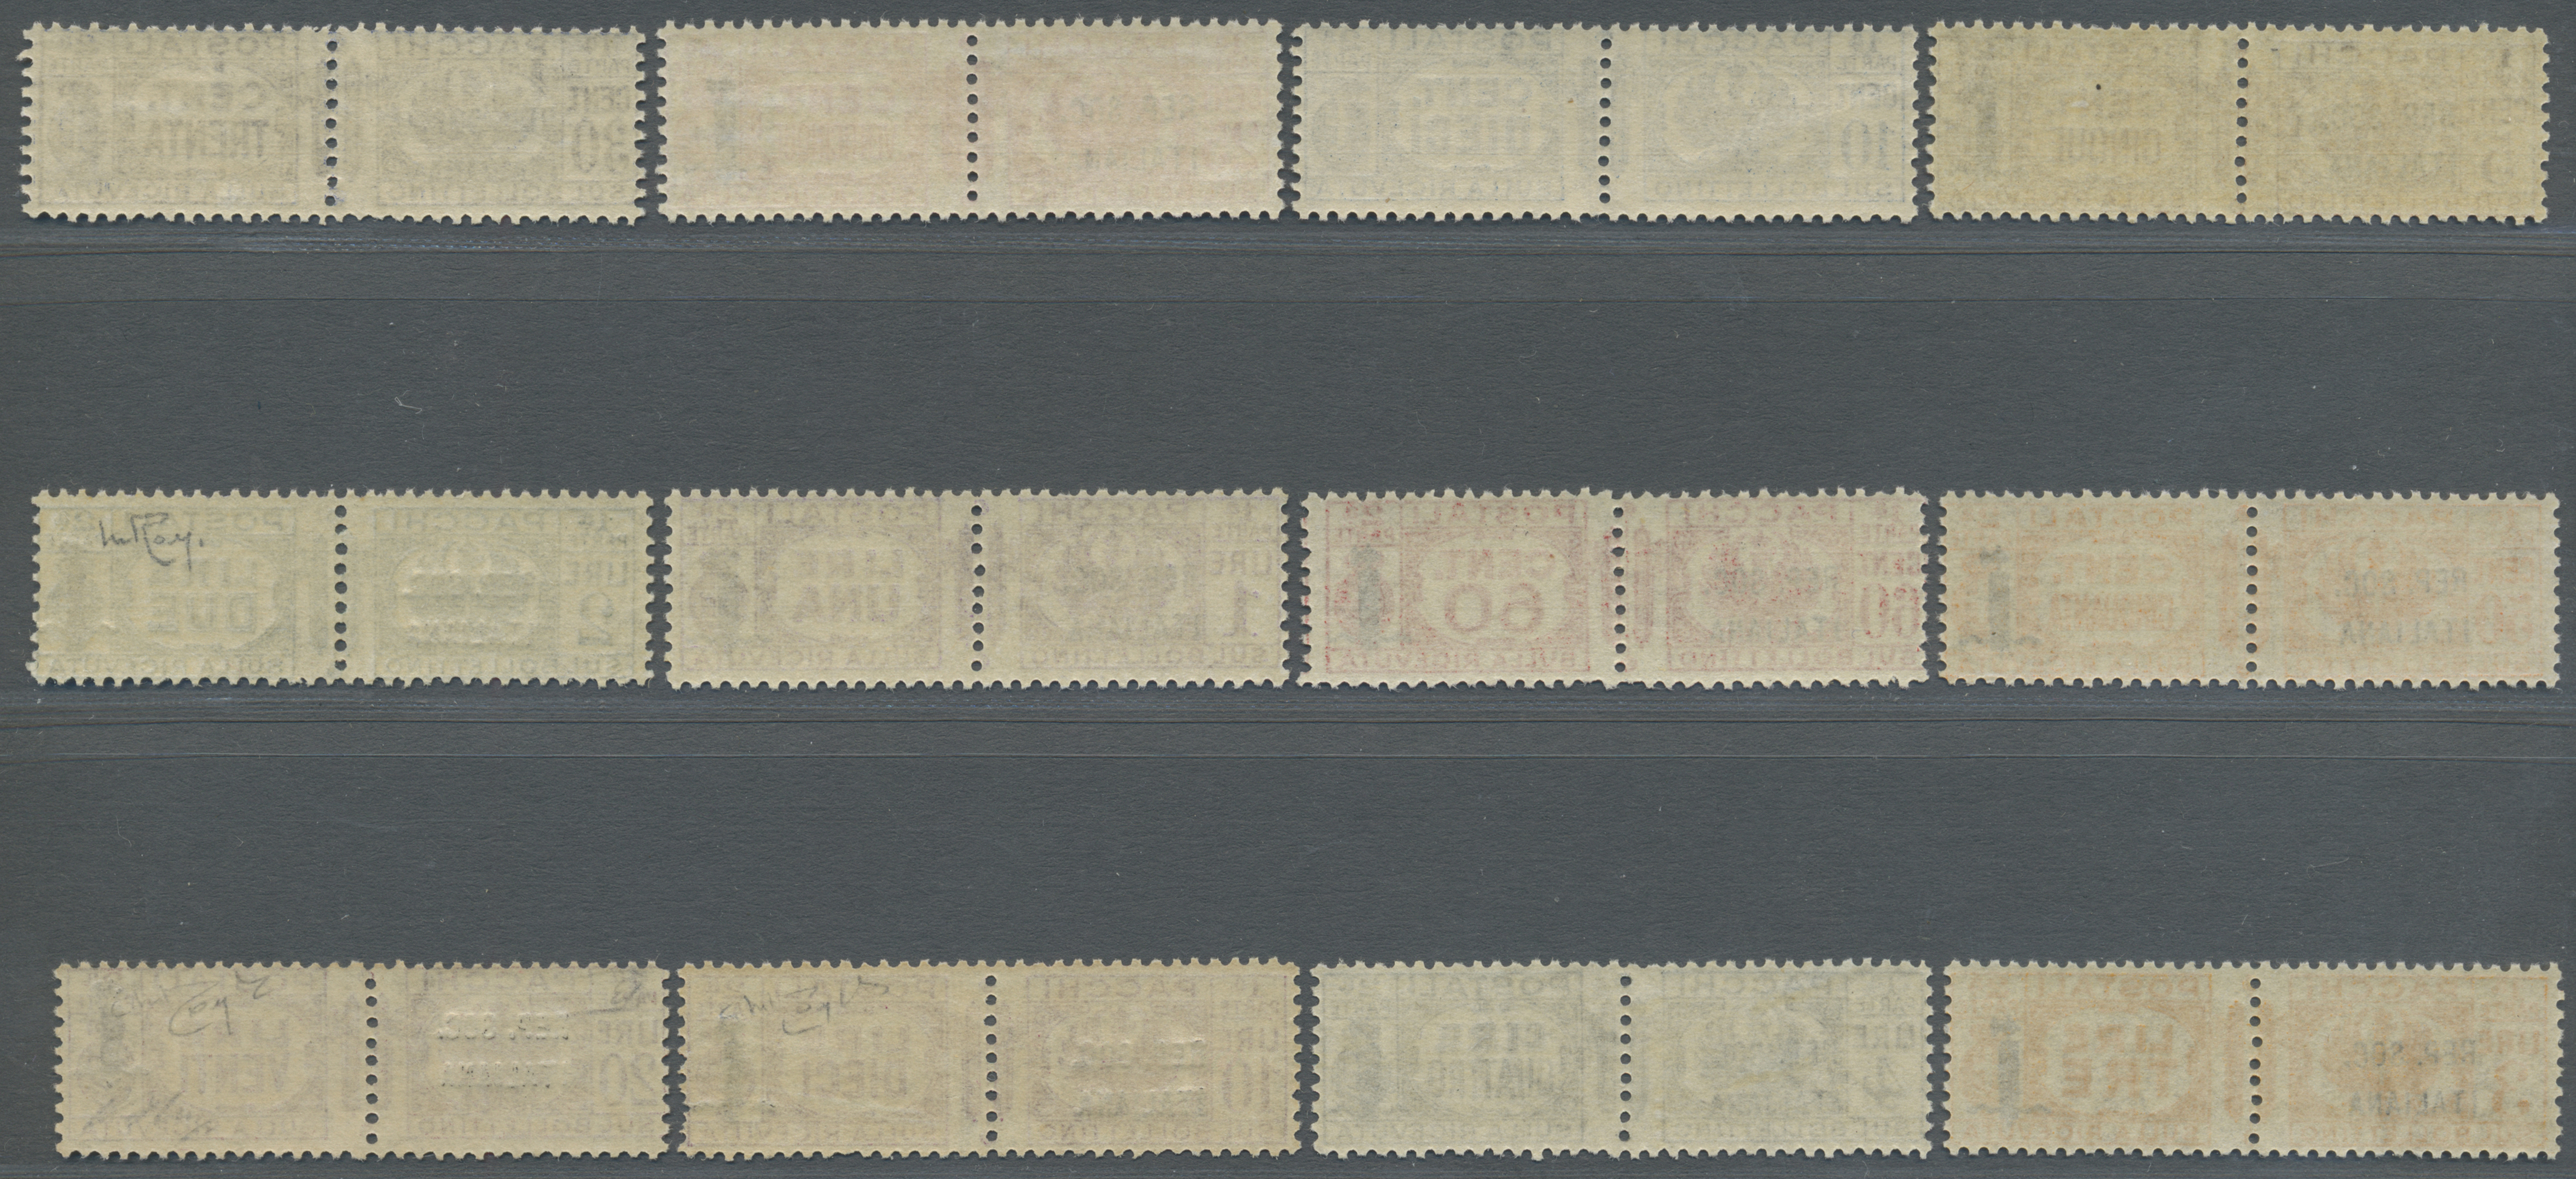 Lot 17099 - italien - paketmarken  -  Auktionshaus Christoph Gärtner GmbH & Co. KG Single lots Philately Overseas & Europe. Auction #39 Day 4